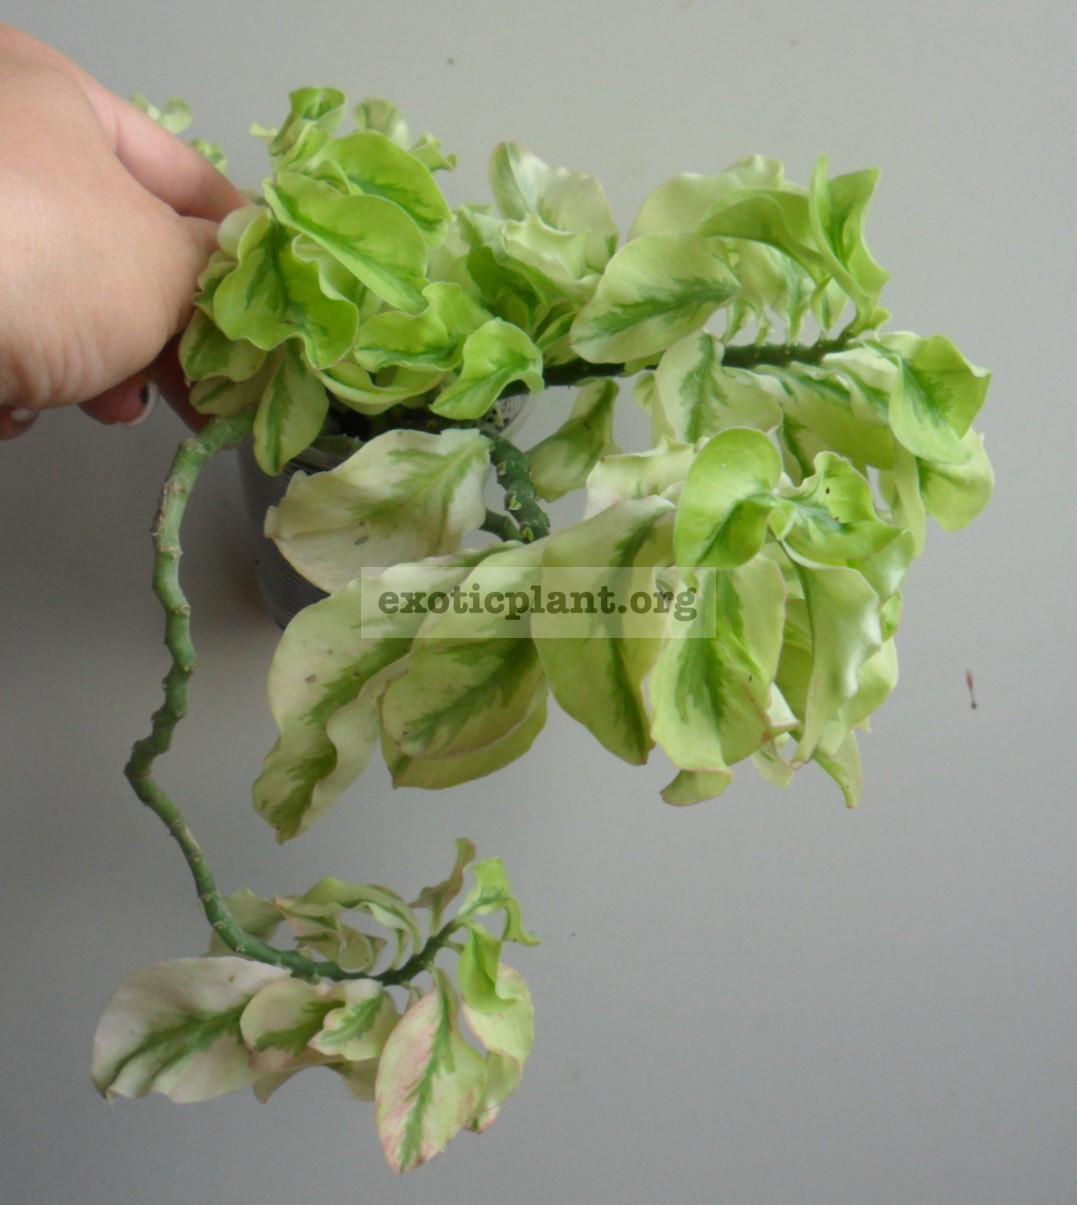 Pedilanthus sp variegated (trailing form) 10